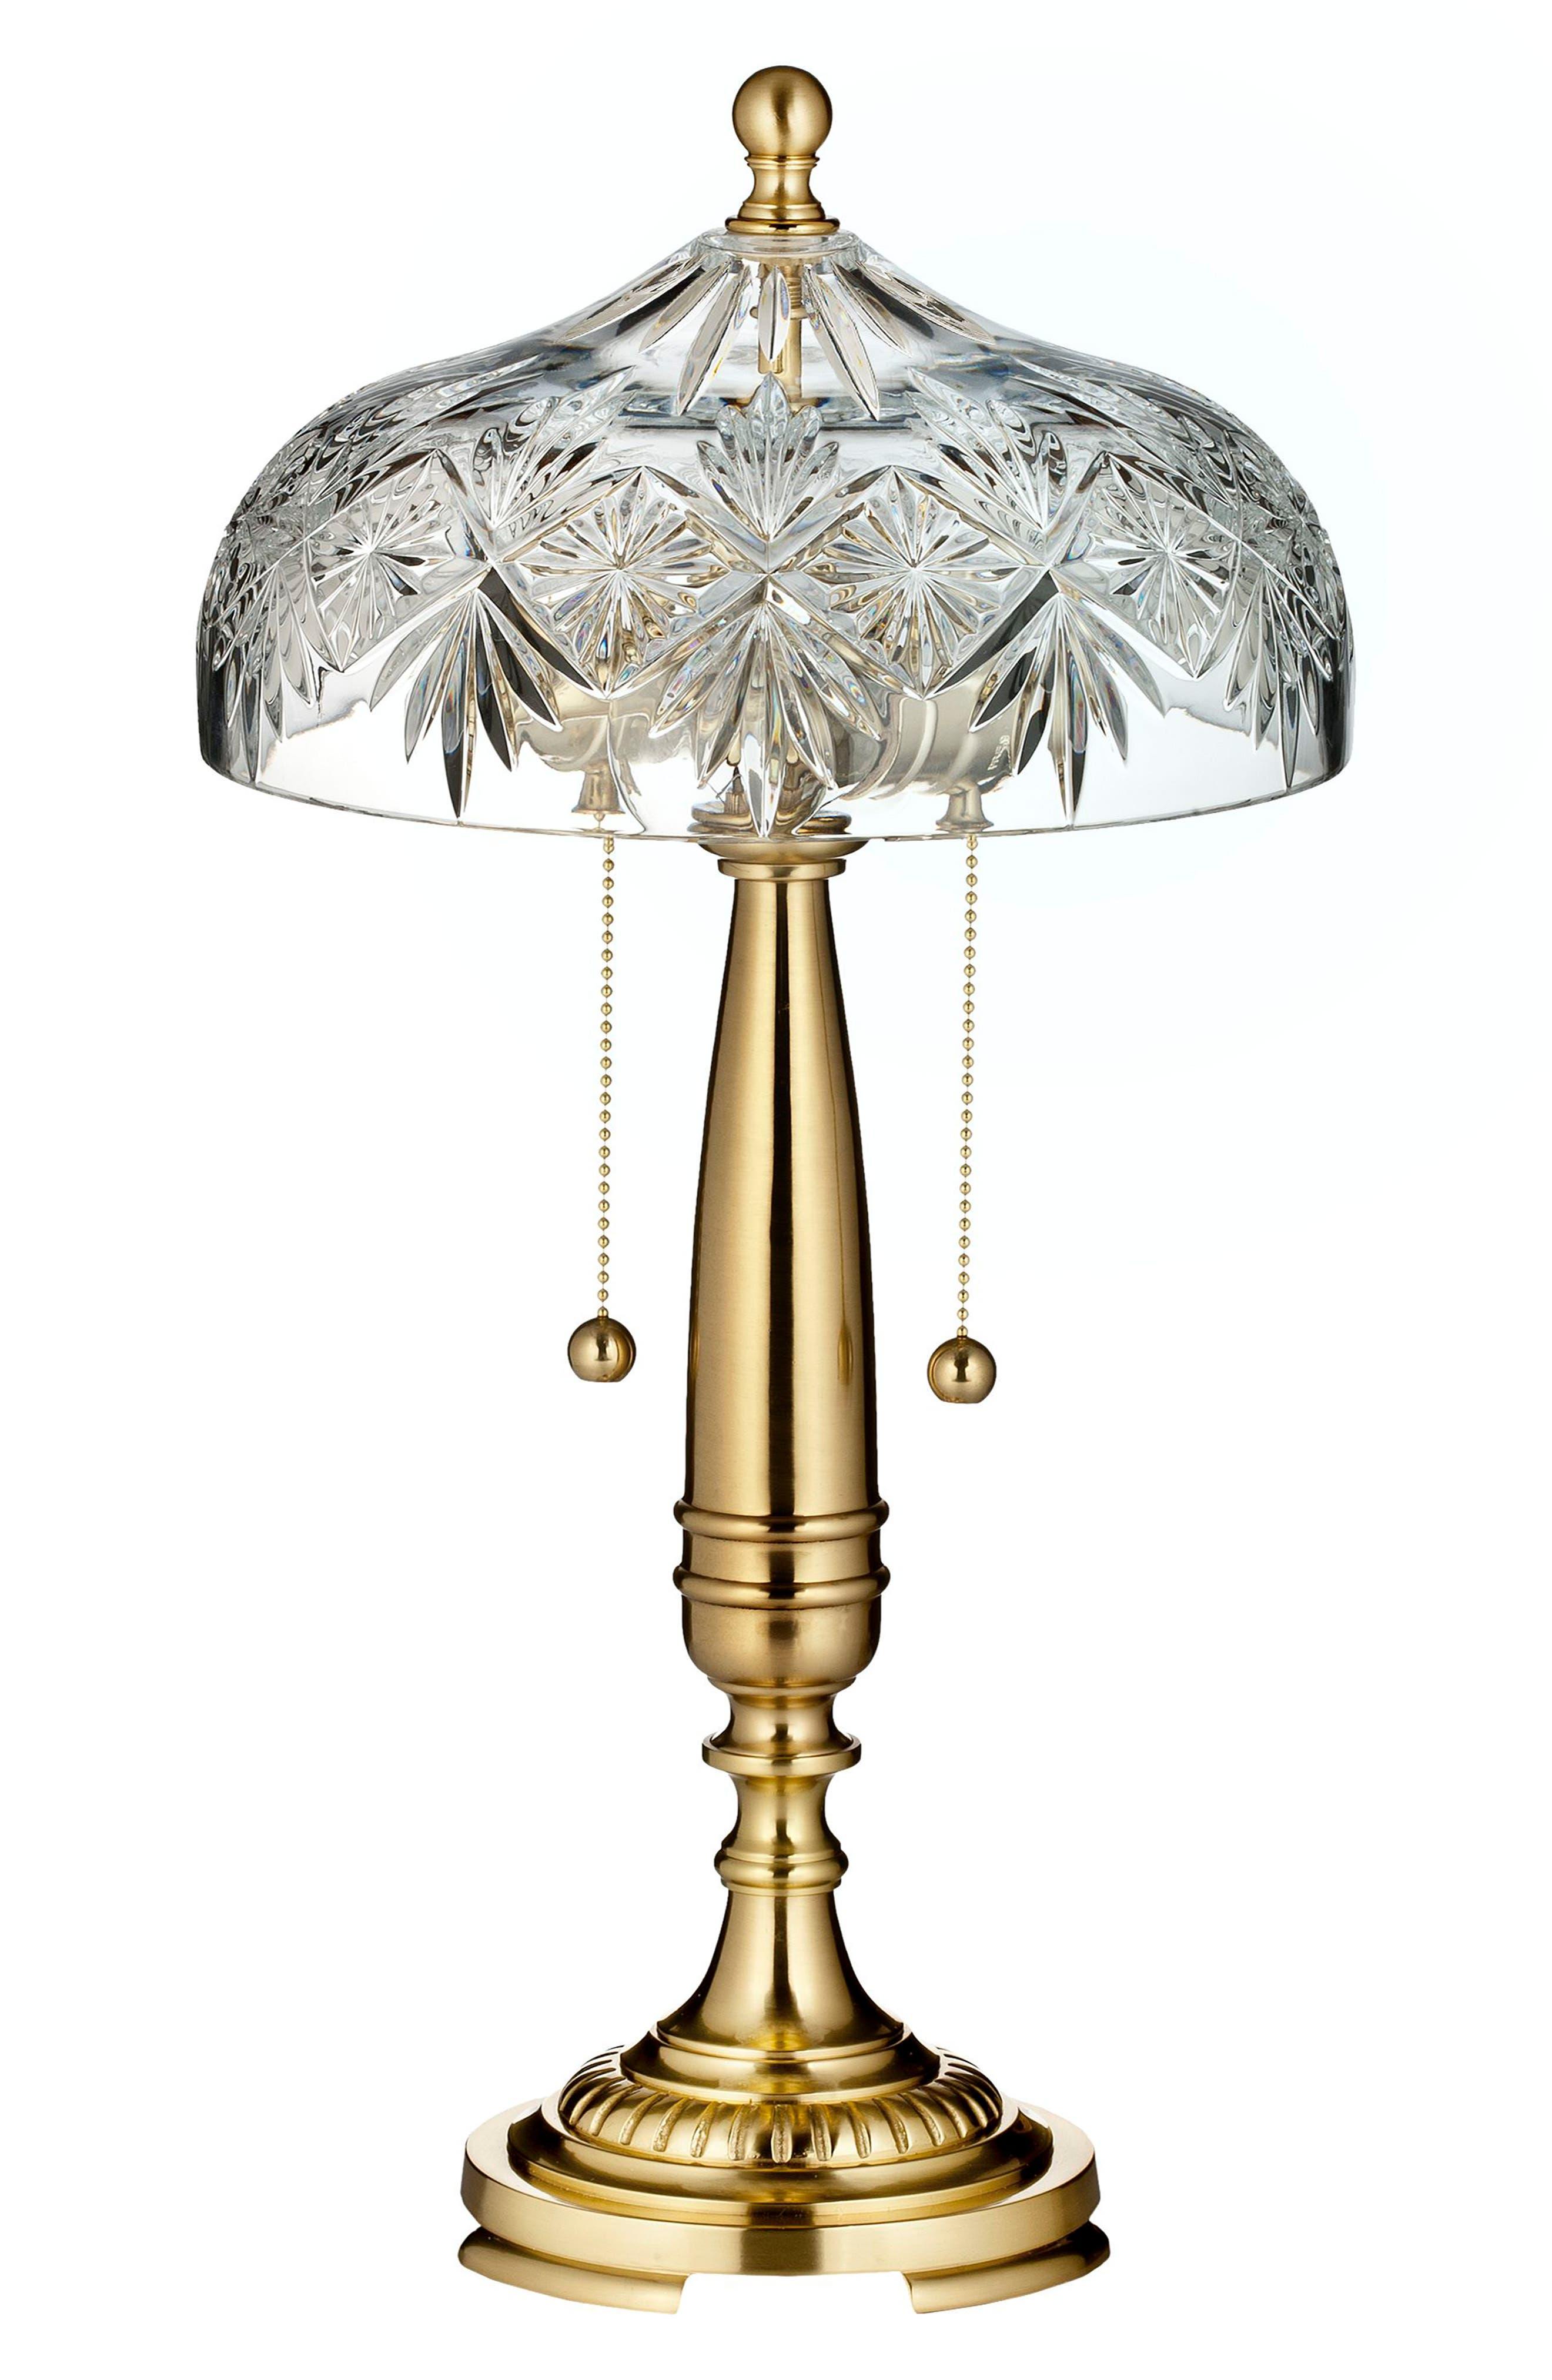 Waterford Renmore Lead Crystal Table Lamp